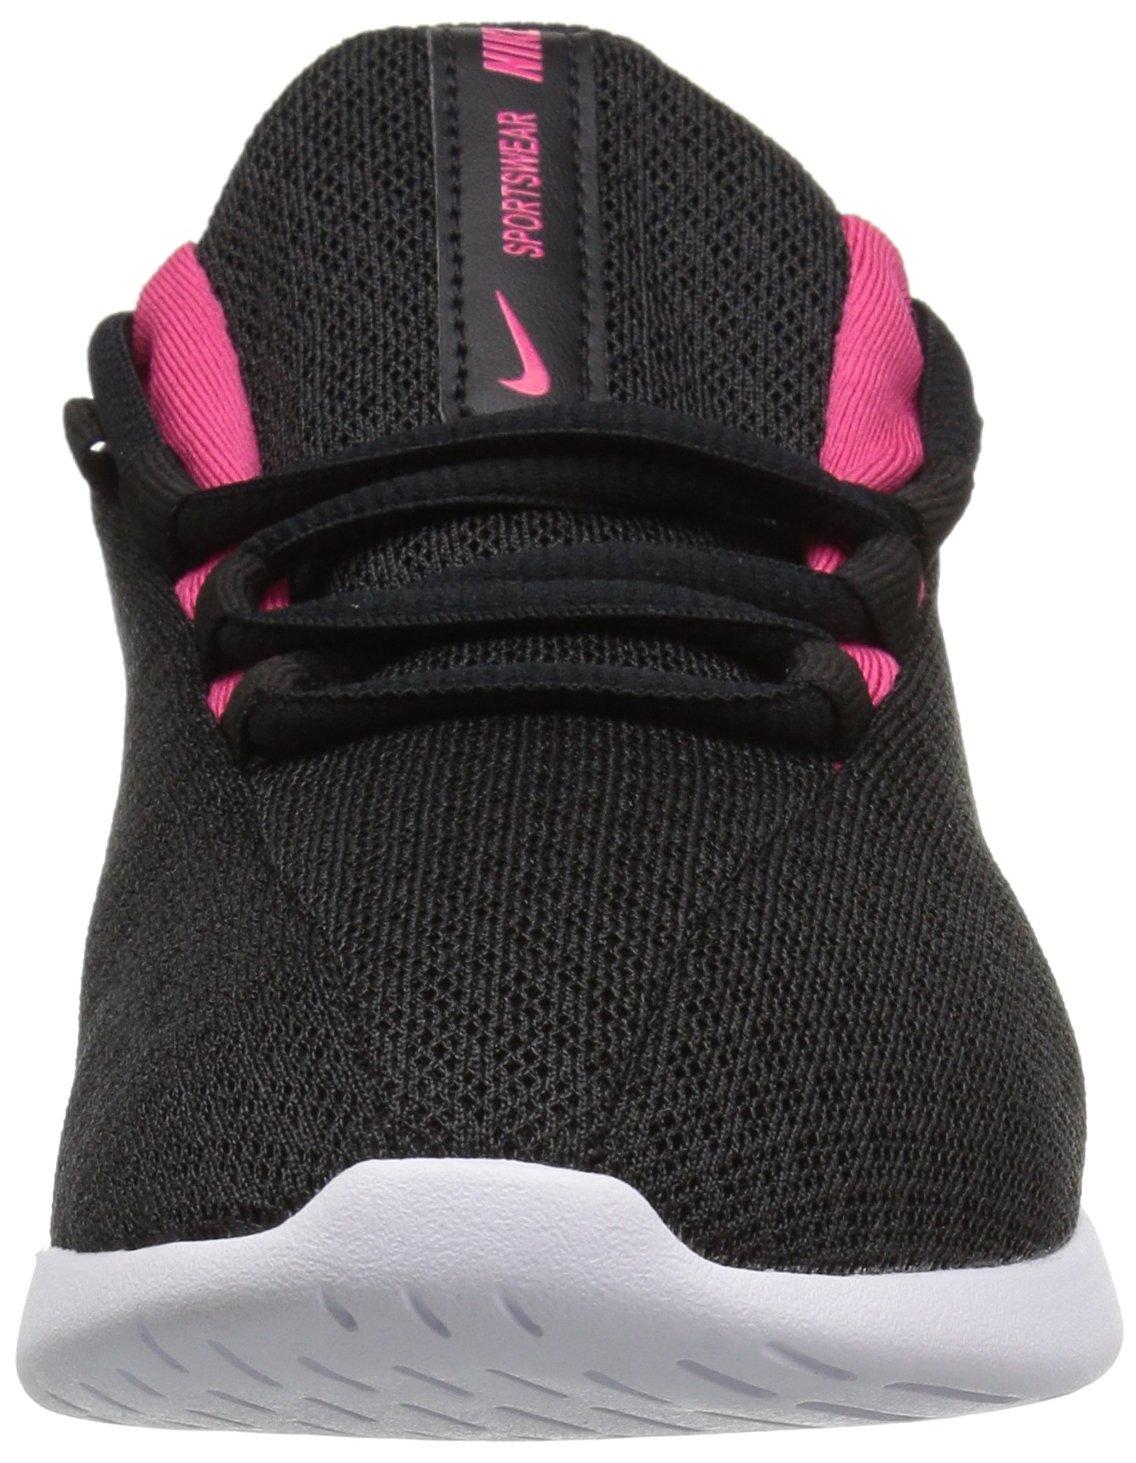 Nike Girls' Viale (GS) Running Shoe, Black/Rush Pink-White, 5Y Youth US Big Kid by Nike (Image #4)